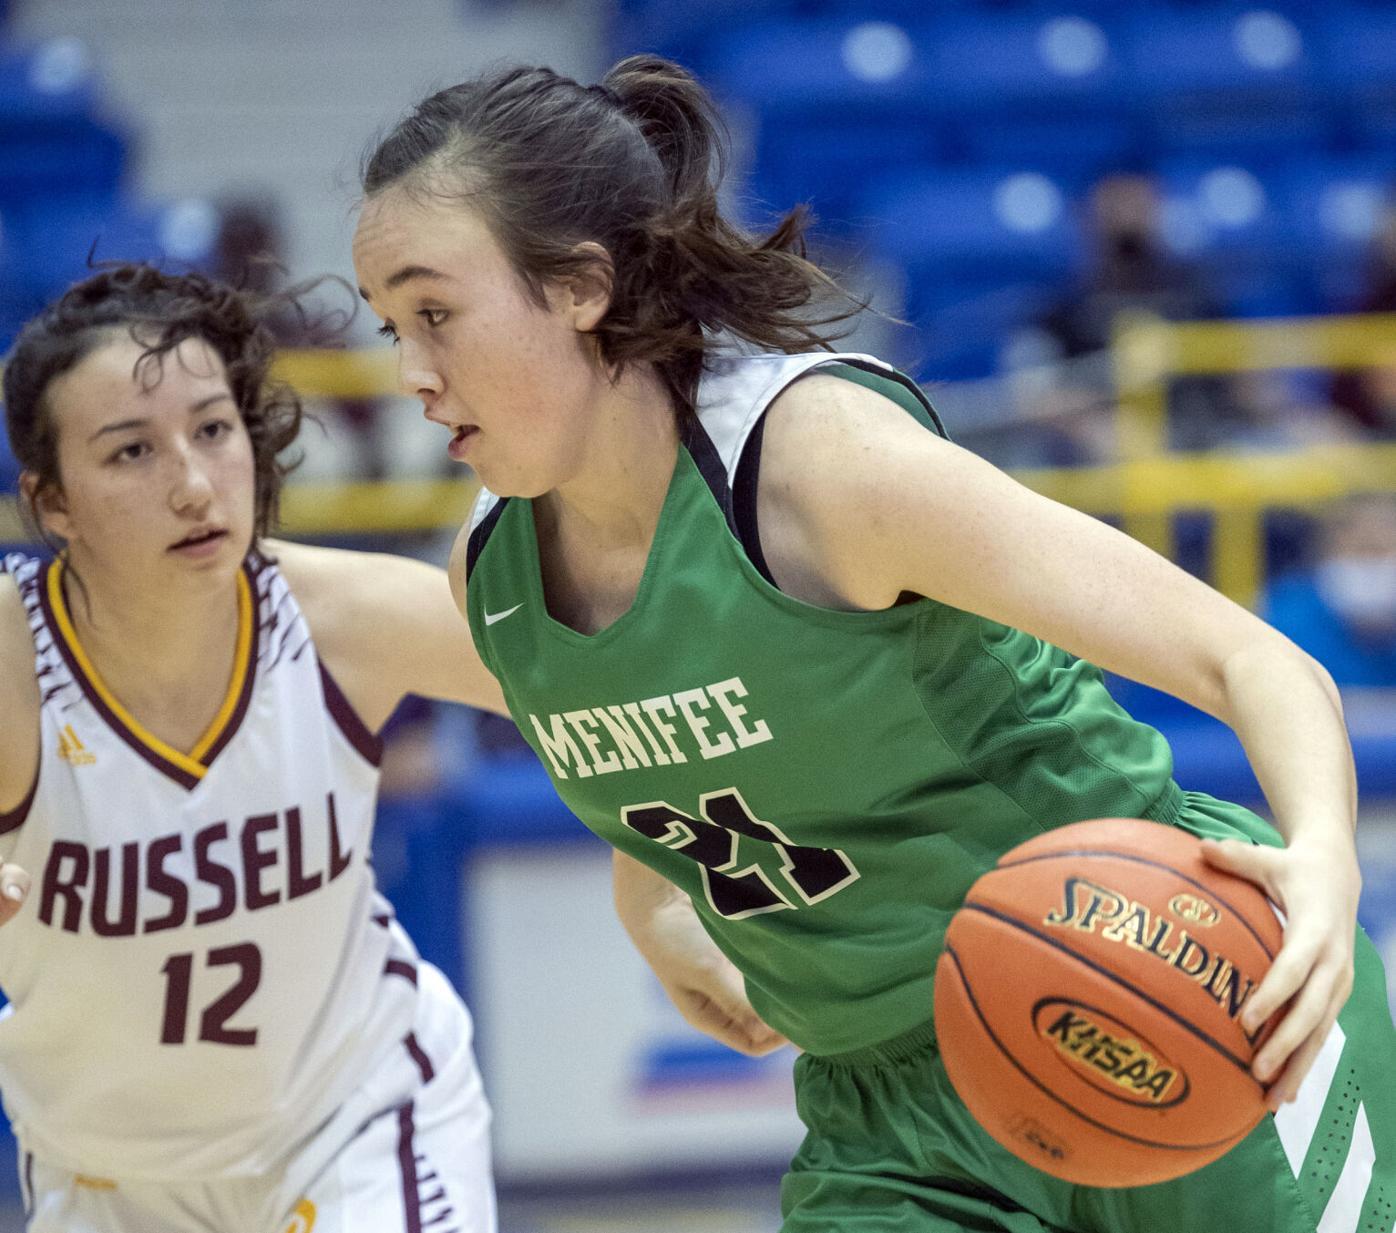 Russell v Menifee Girls Regional